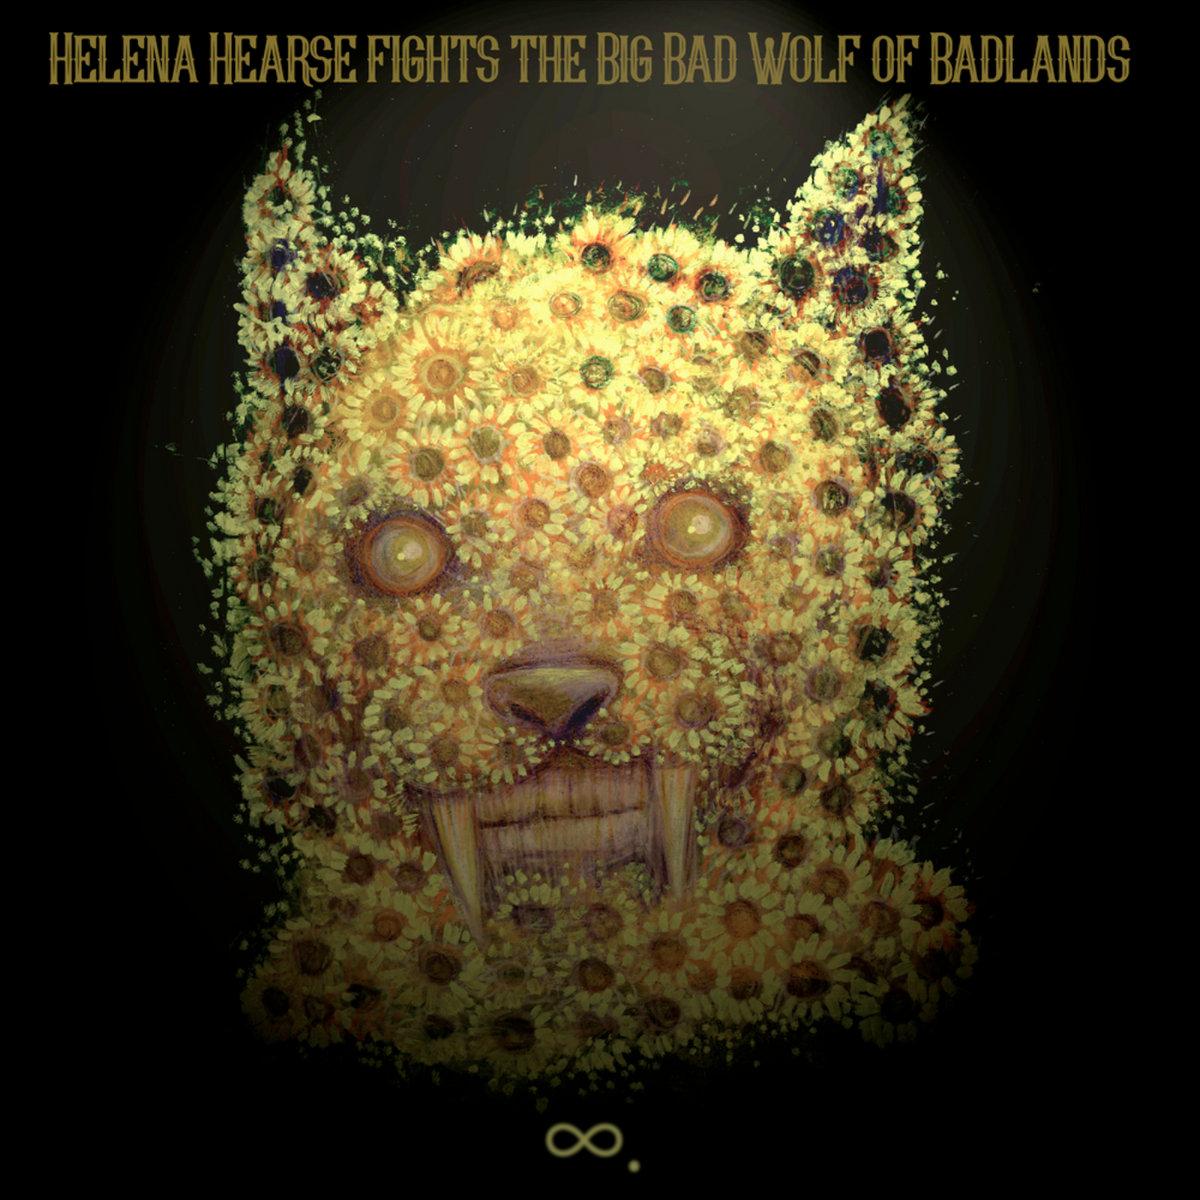 Helena Hearse Fights the Big Bad Wolf of Badlands: Episode 1